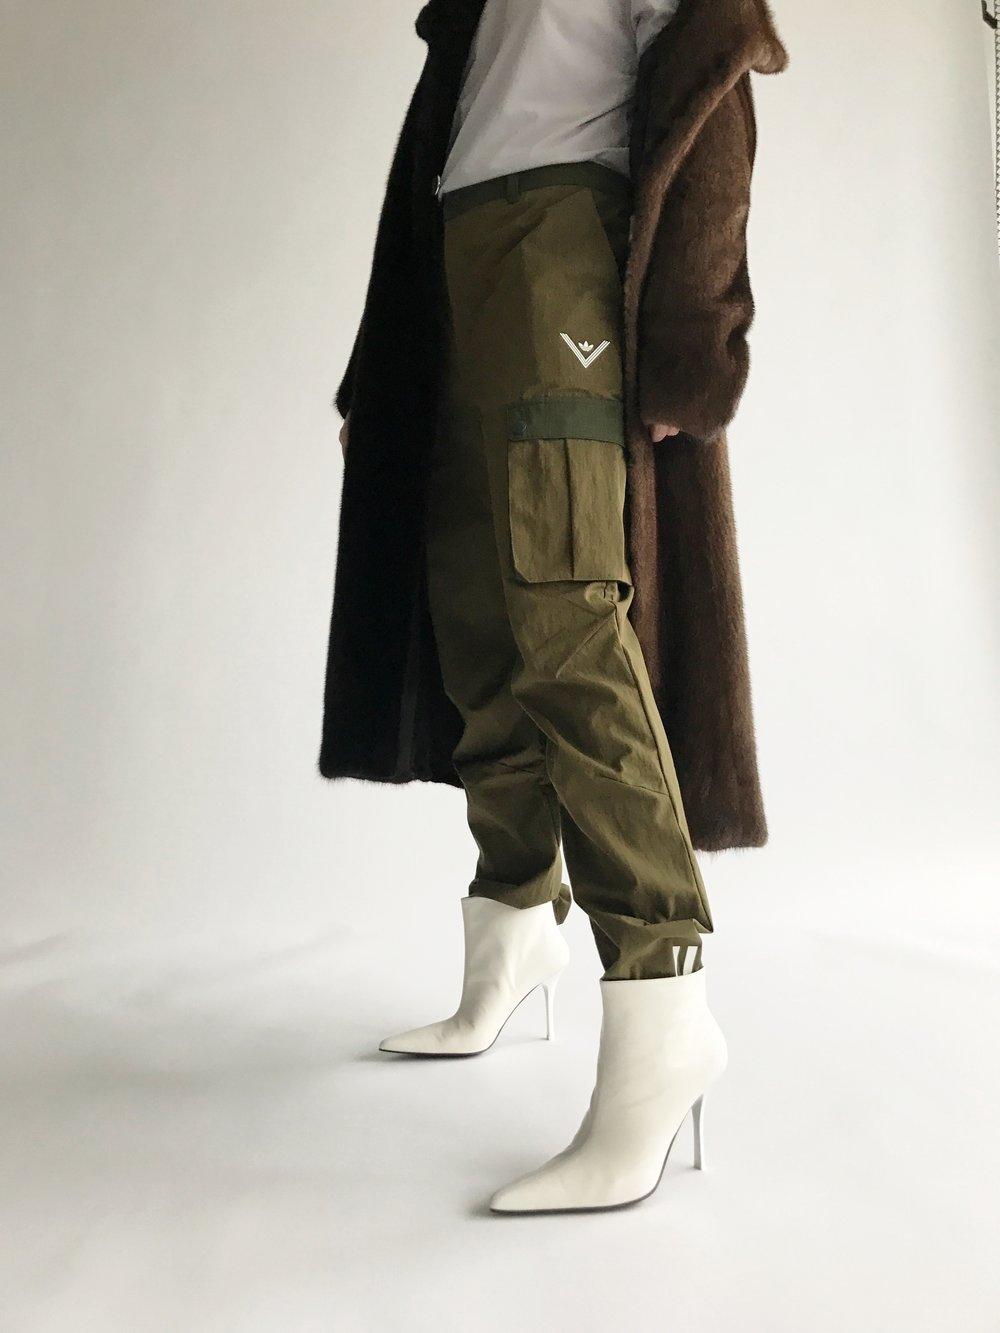 Fur: Freja Dalsjø, shirt: Nike, pants: Adidas, shoes: Celine